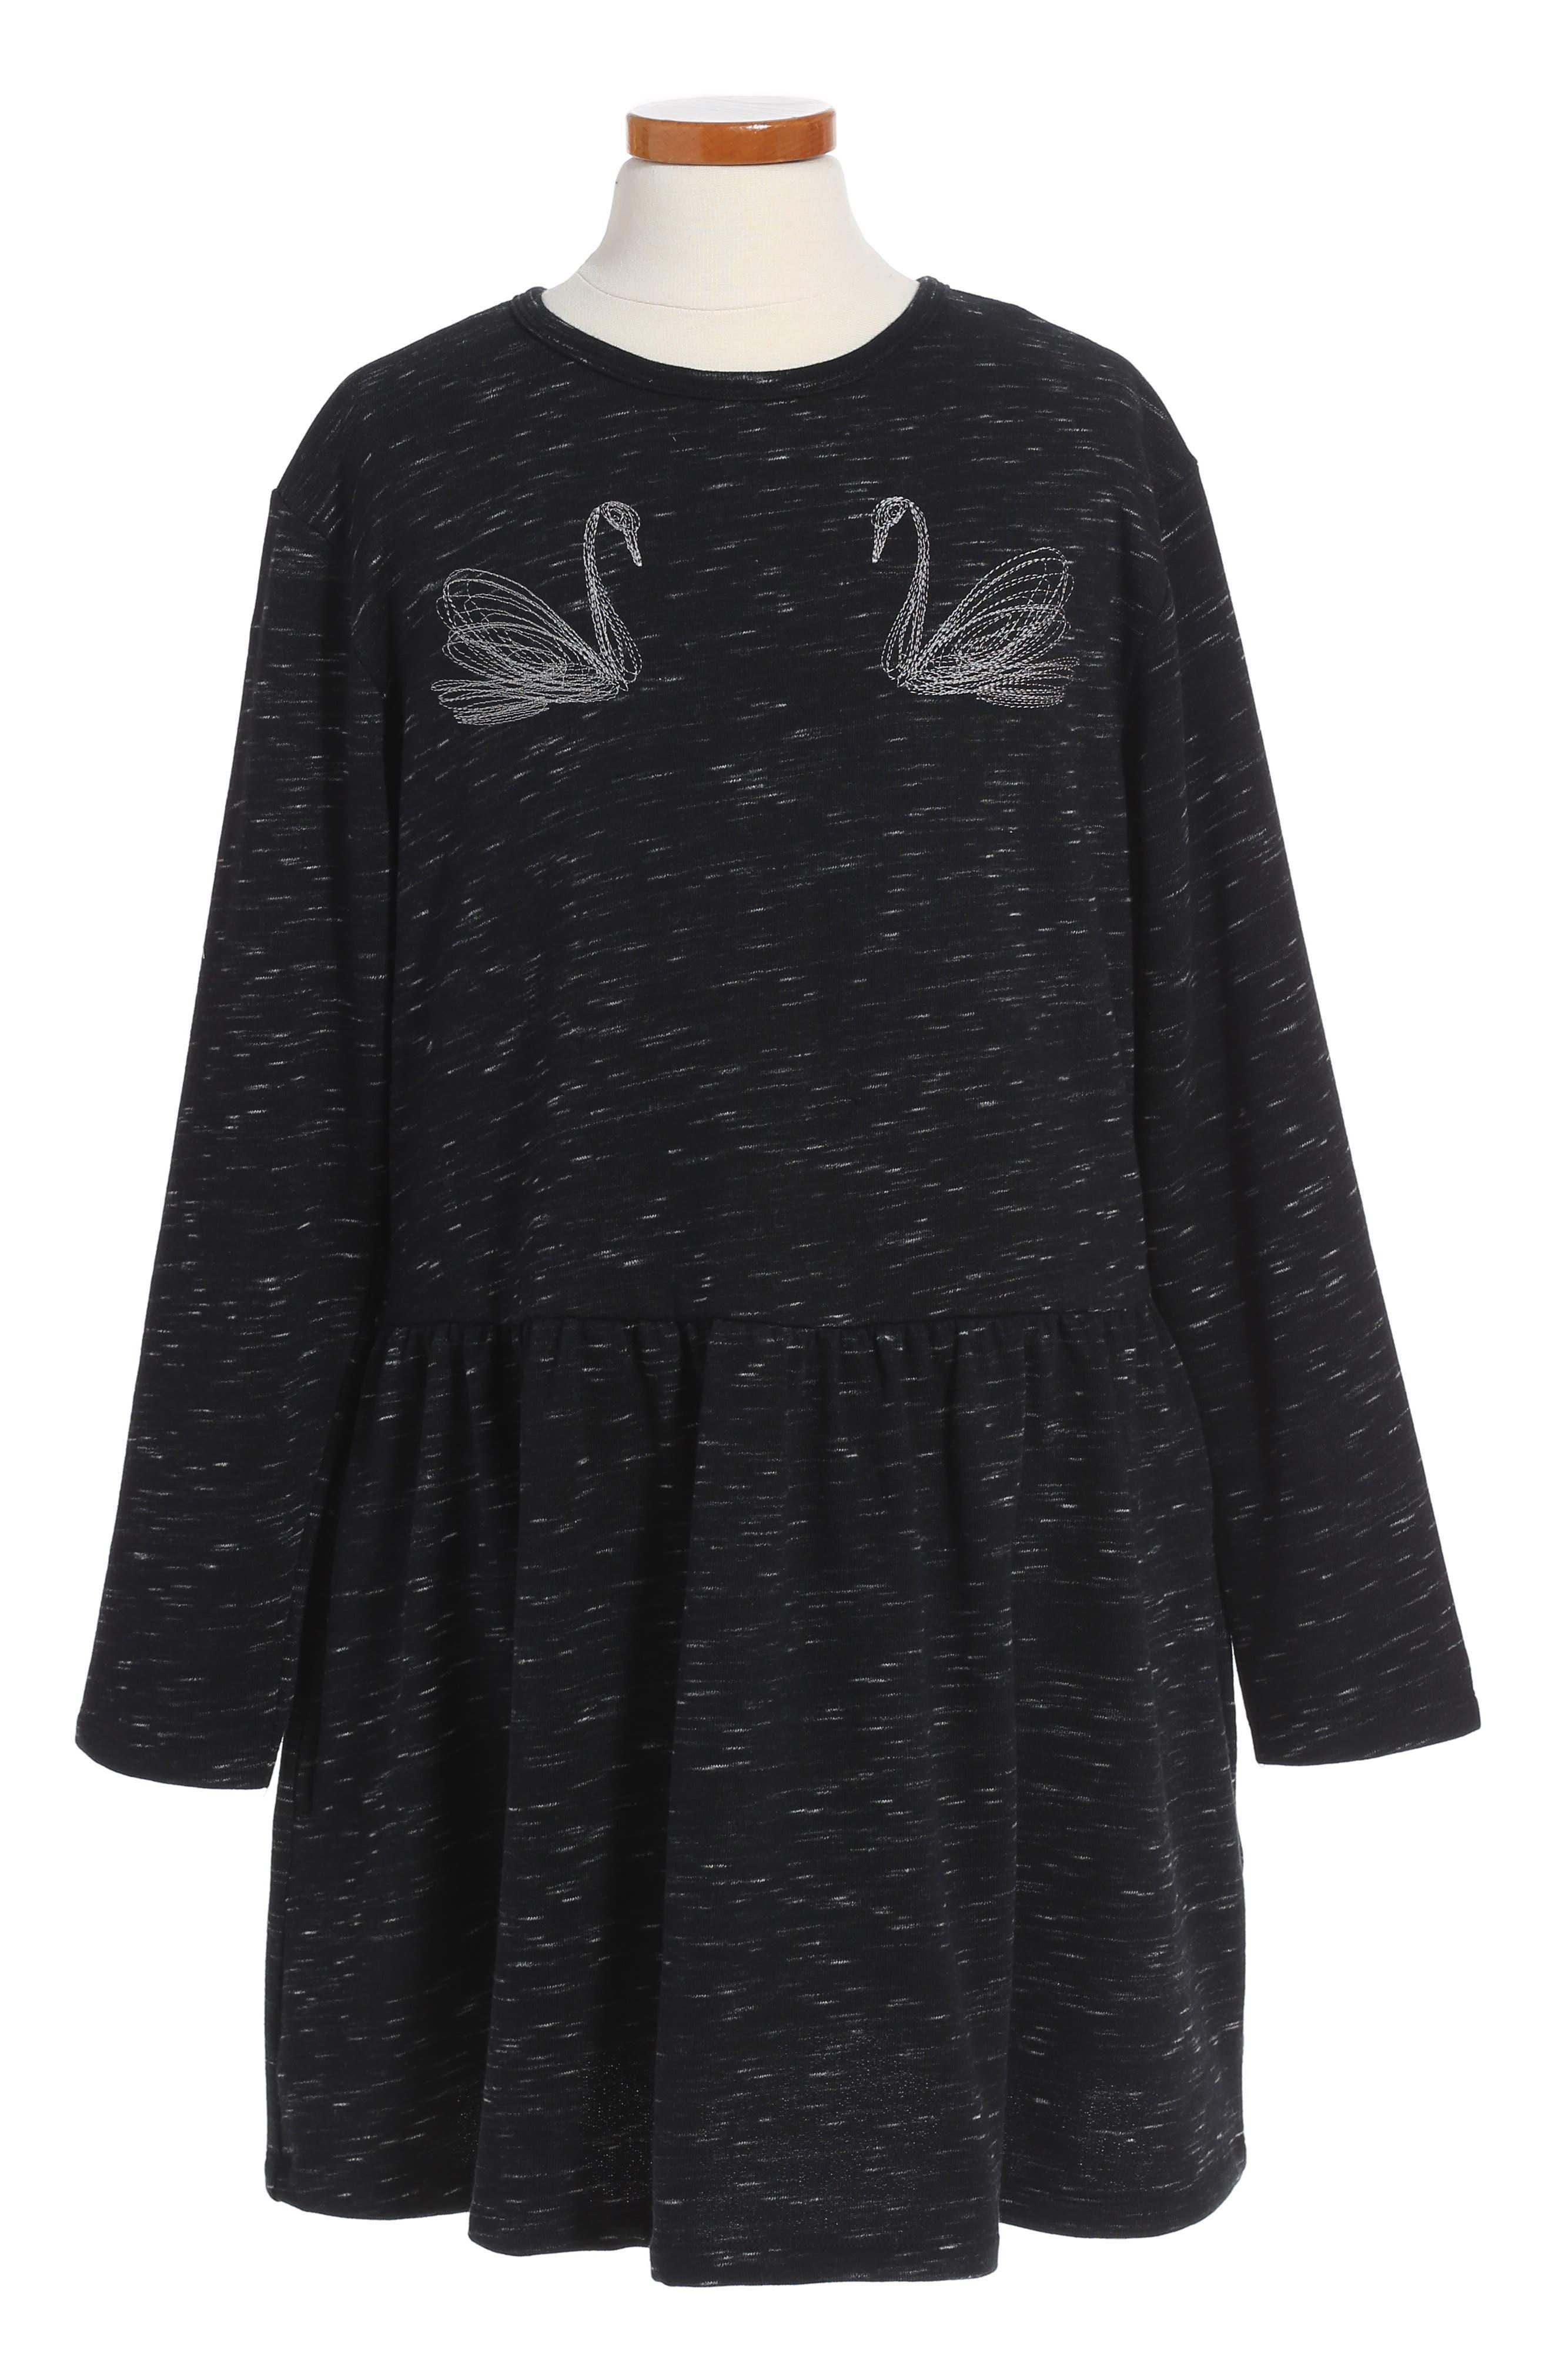 Stella McCartney Kids Marion Embroidered Dress (Toddler Girls, Little Girls & Big Girls)